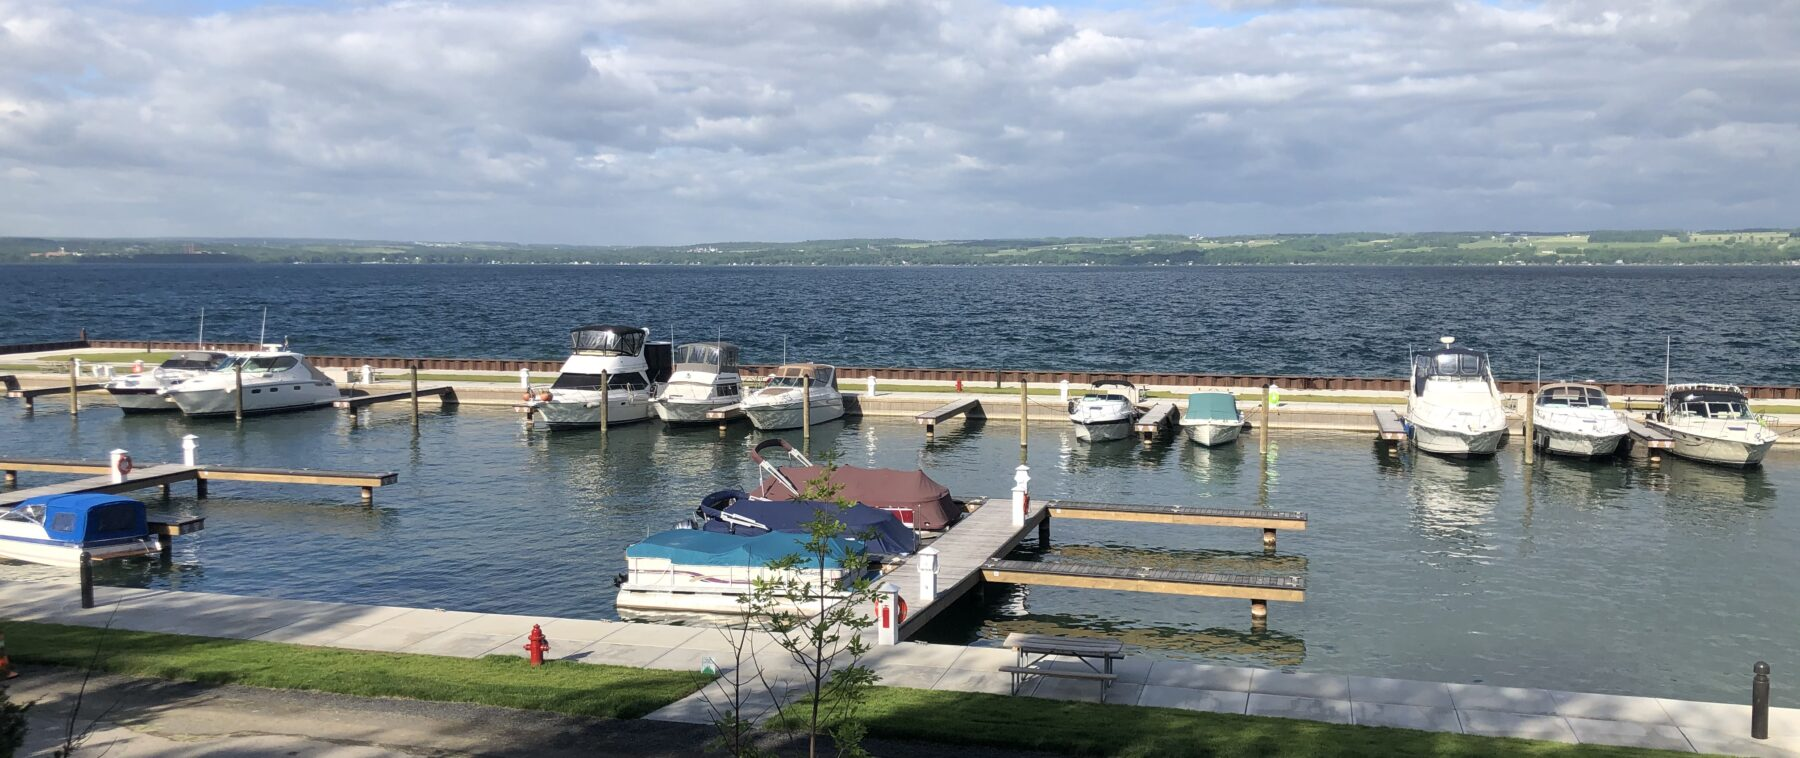 Samsen Marina Seneca Lake from Cabins